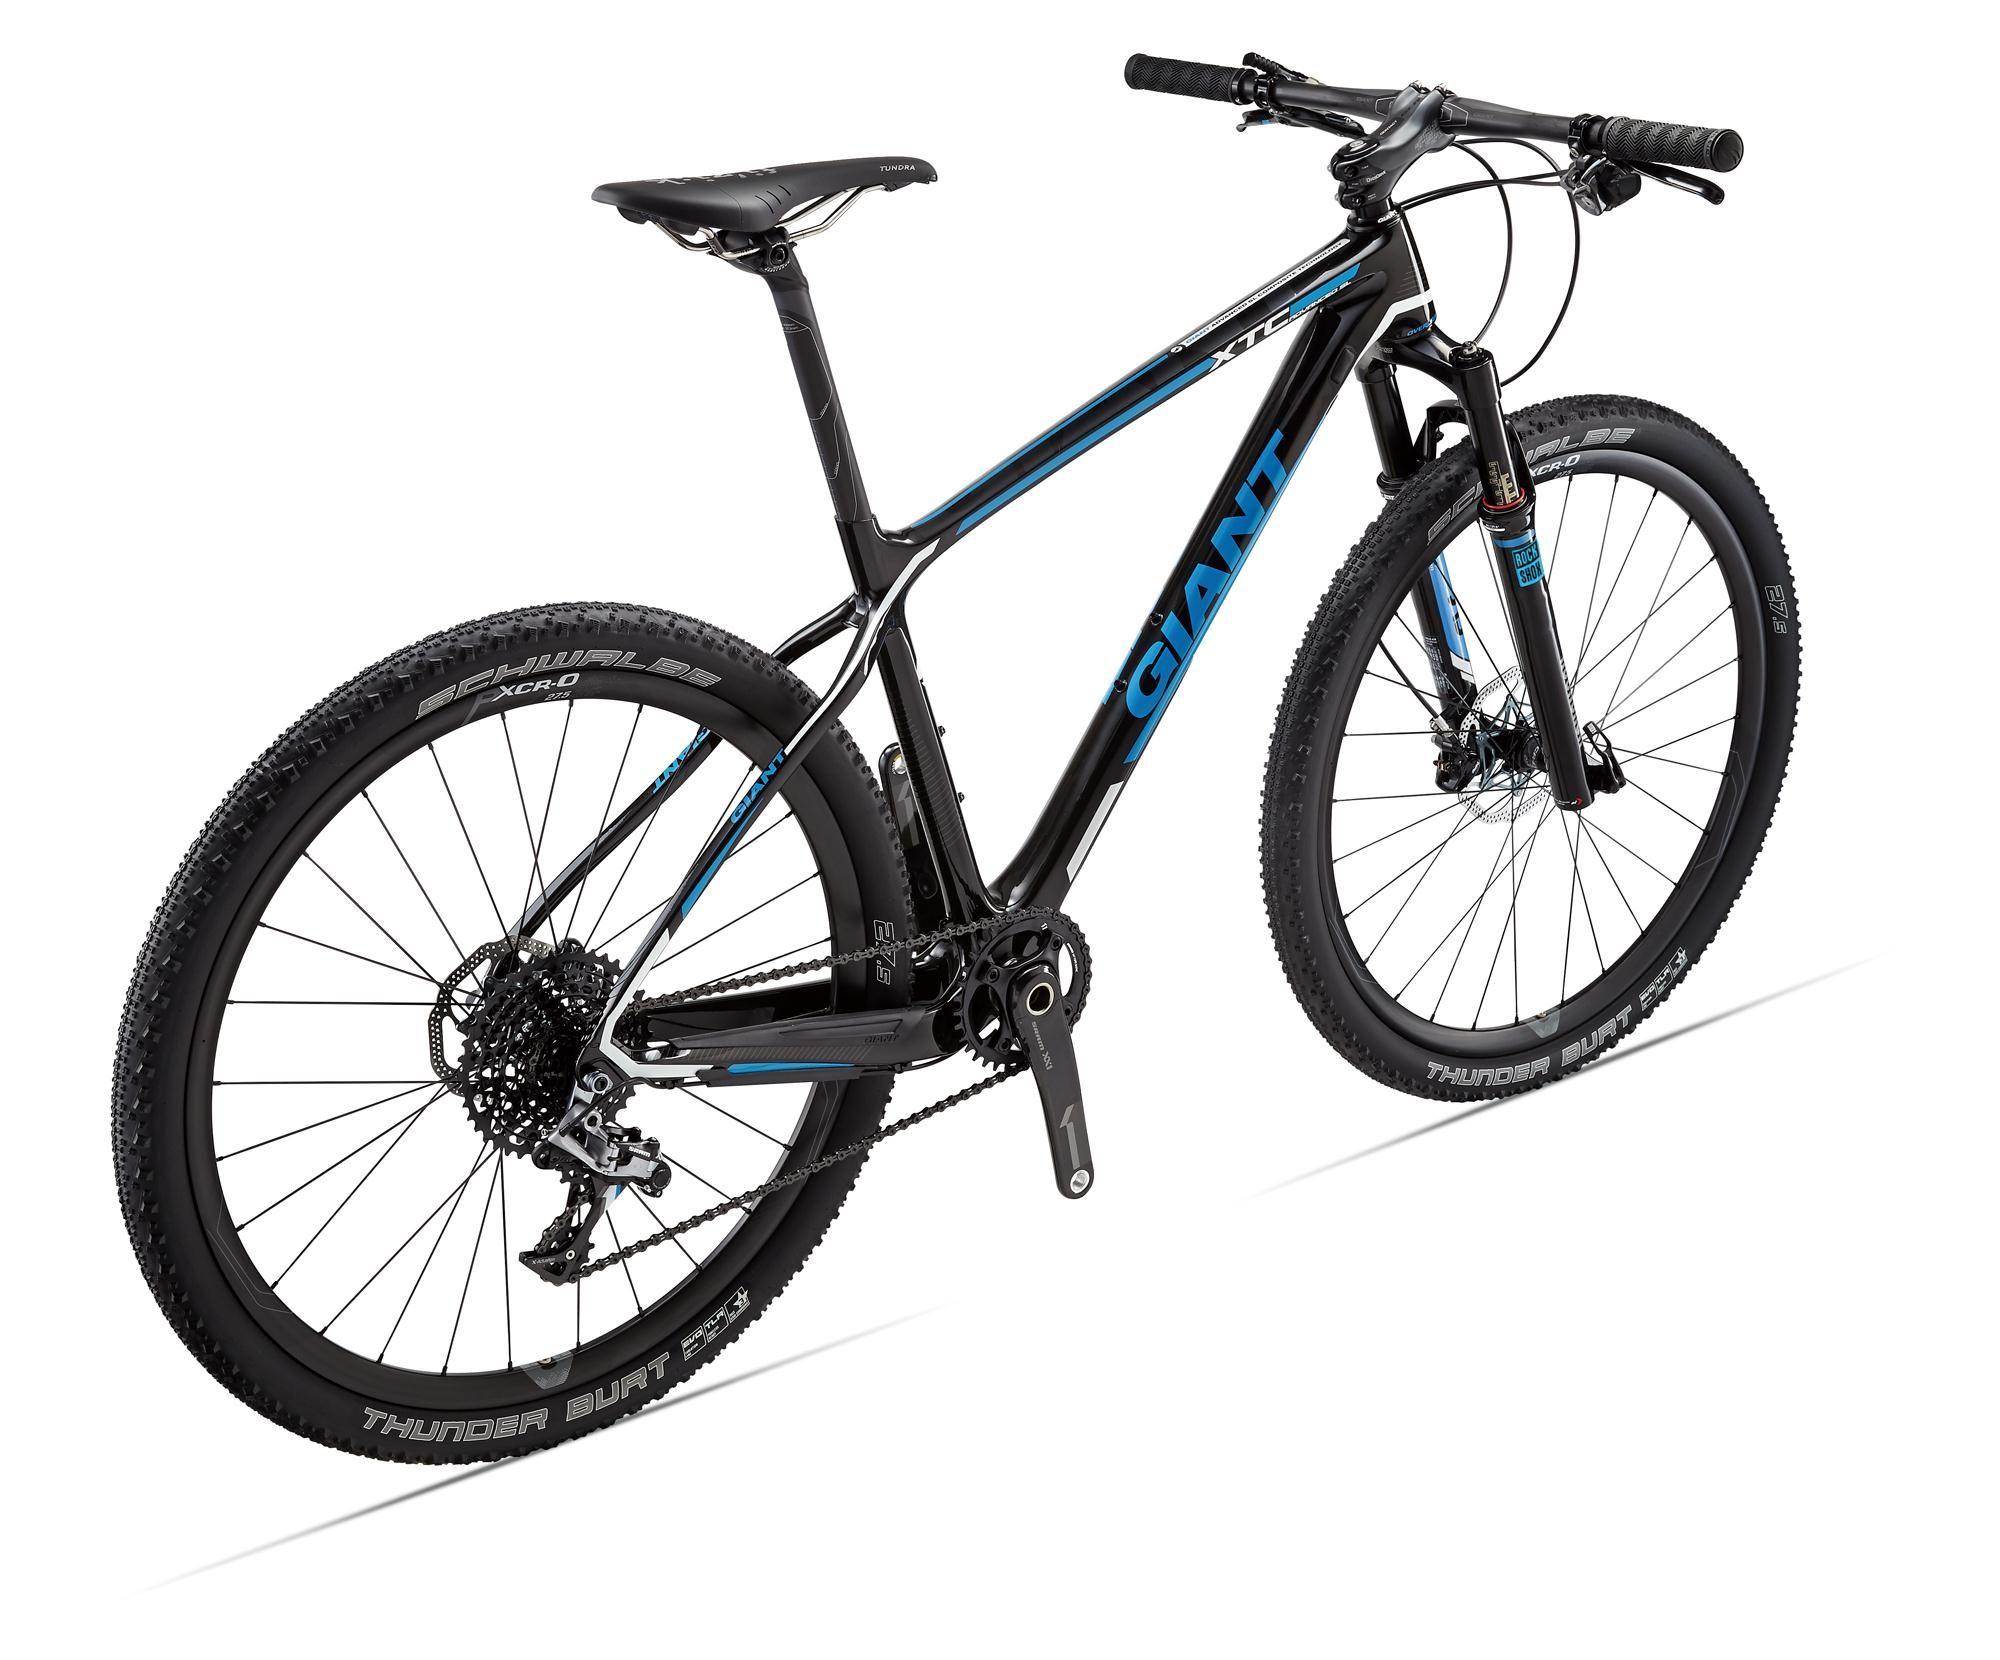 XtC Advanced SL 27.5 0 (2015) | Bicis Giant / Giant Bicycles ...